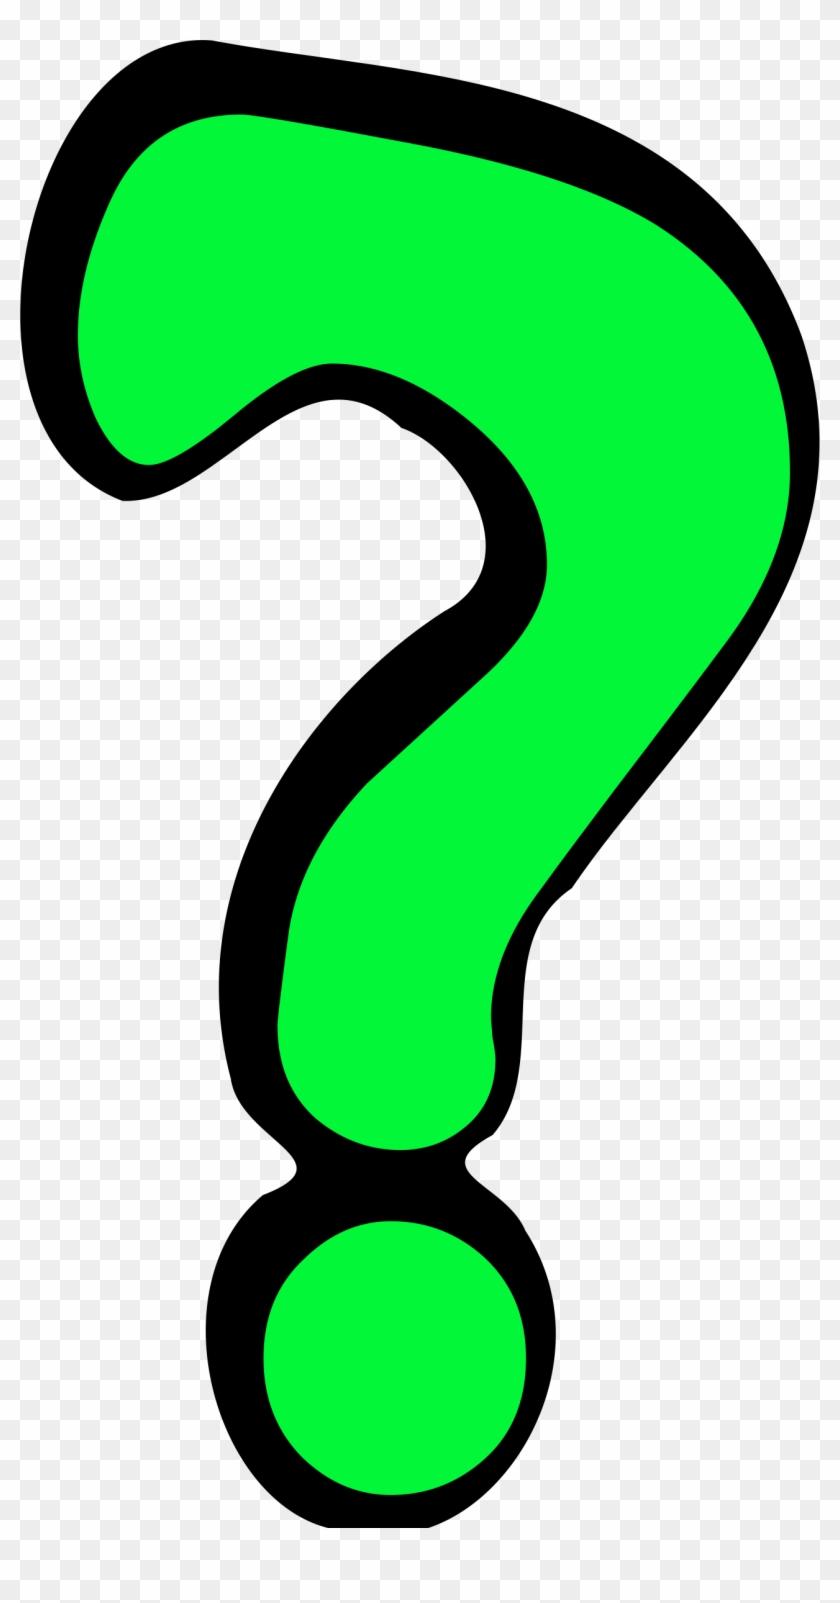 Big Image - Question Mark Clipart #101548